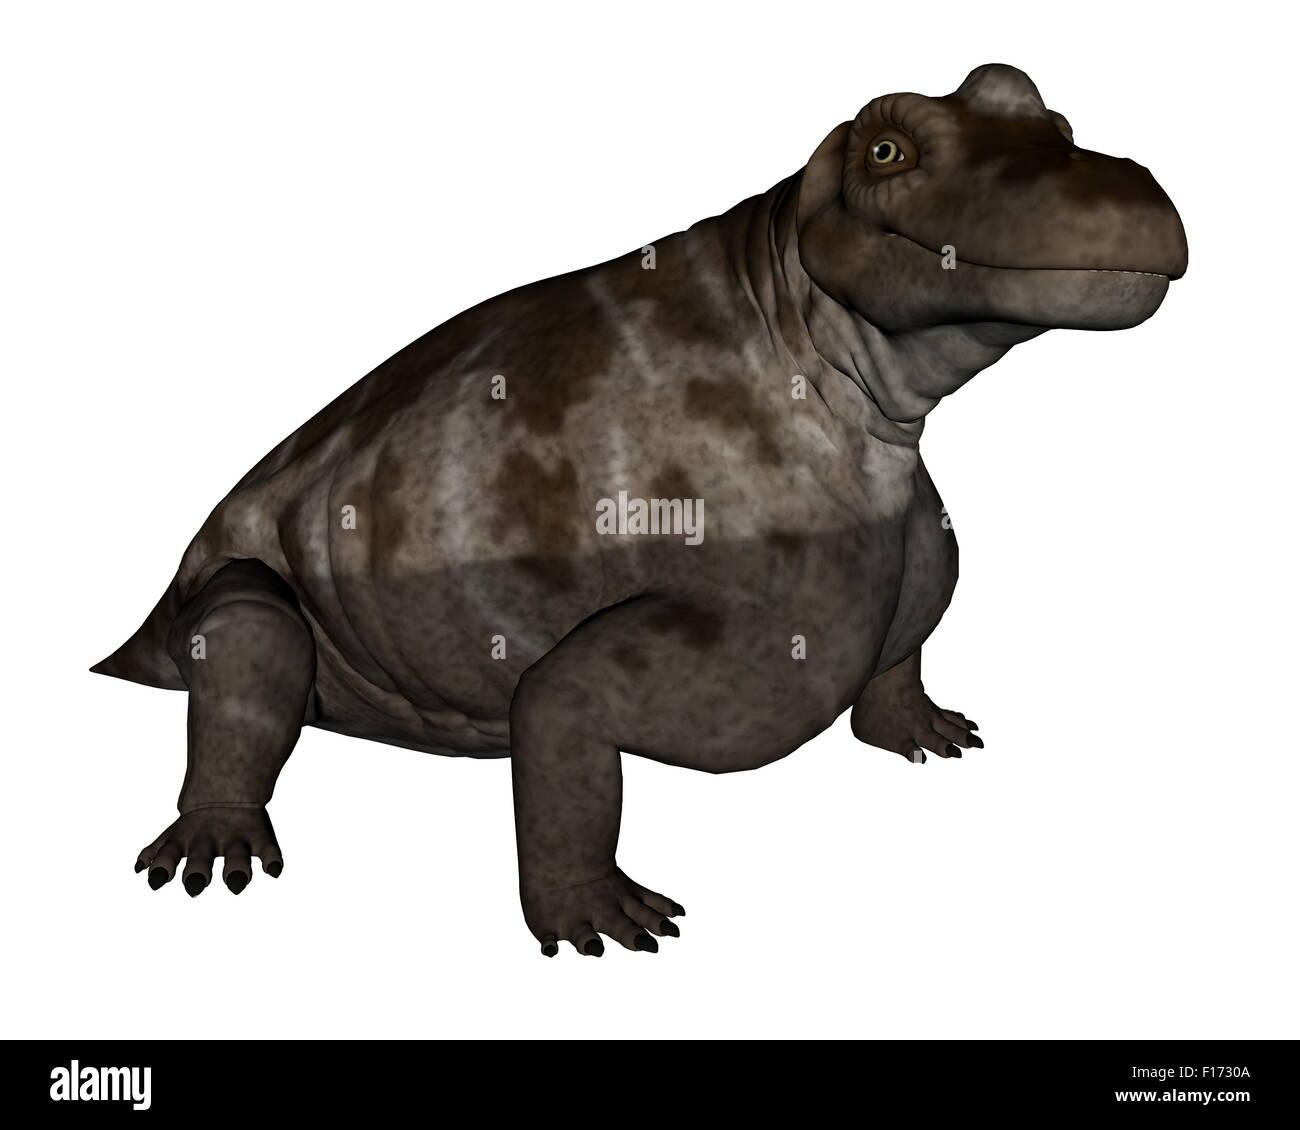 Keratocephalus dinosaur isolated in white background - 3D render - Stock Image